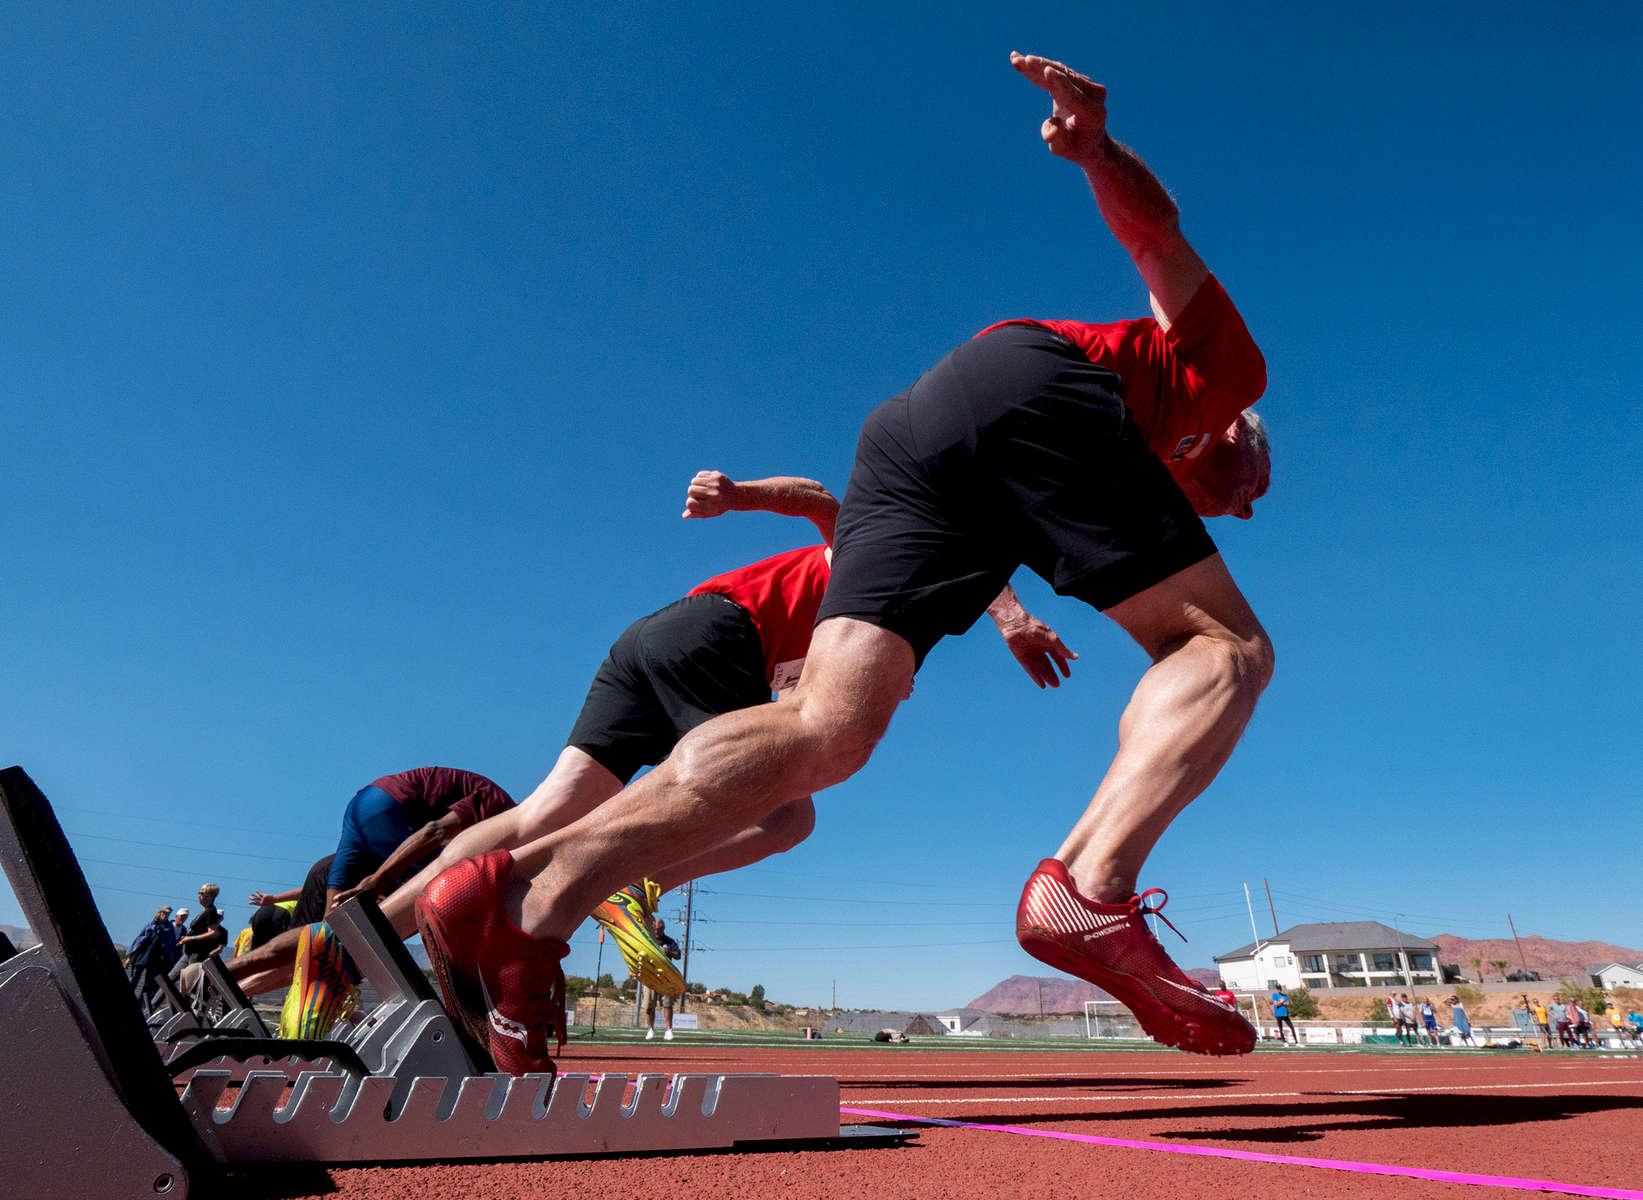 Senior athletes start the 50m dash during the Huntsman World Senior Games on October 15, 2019 in St. George, Utah.